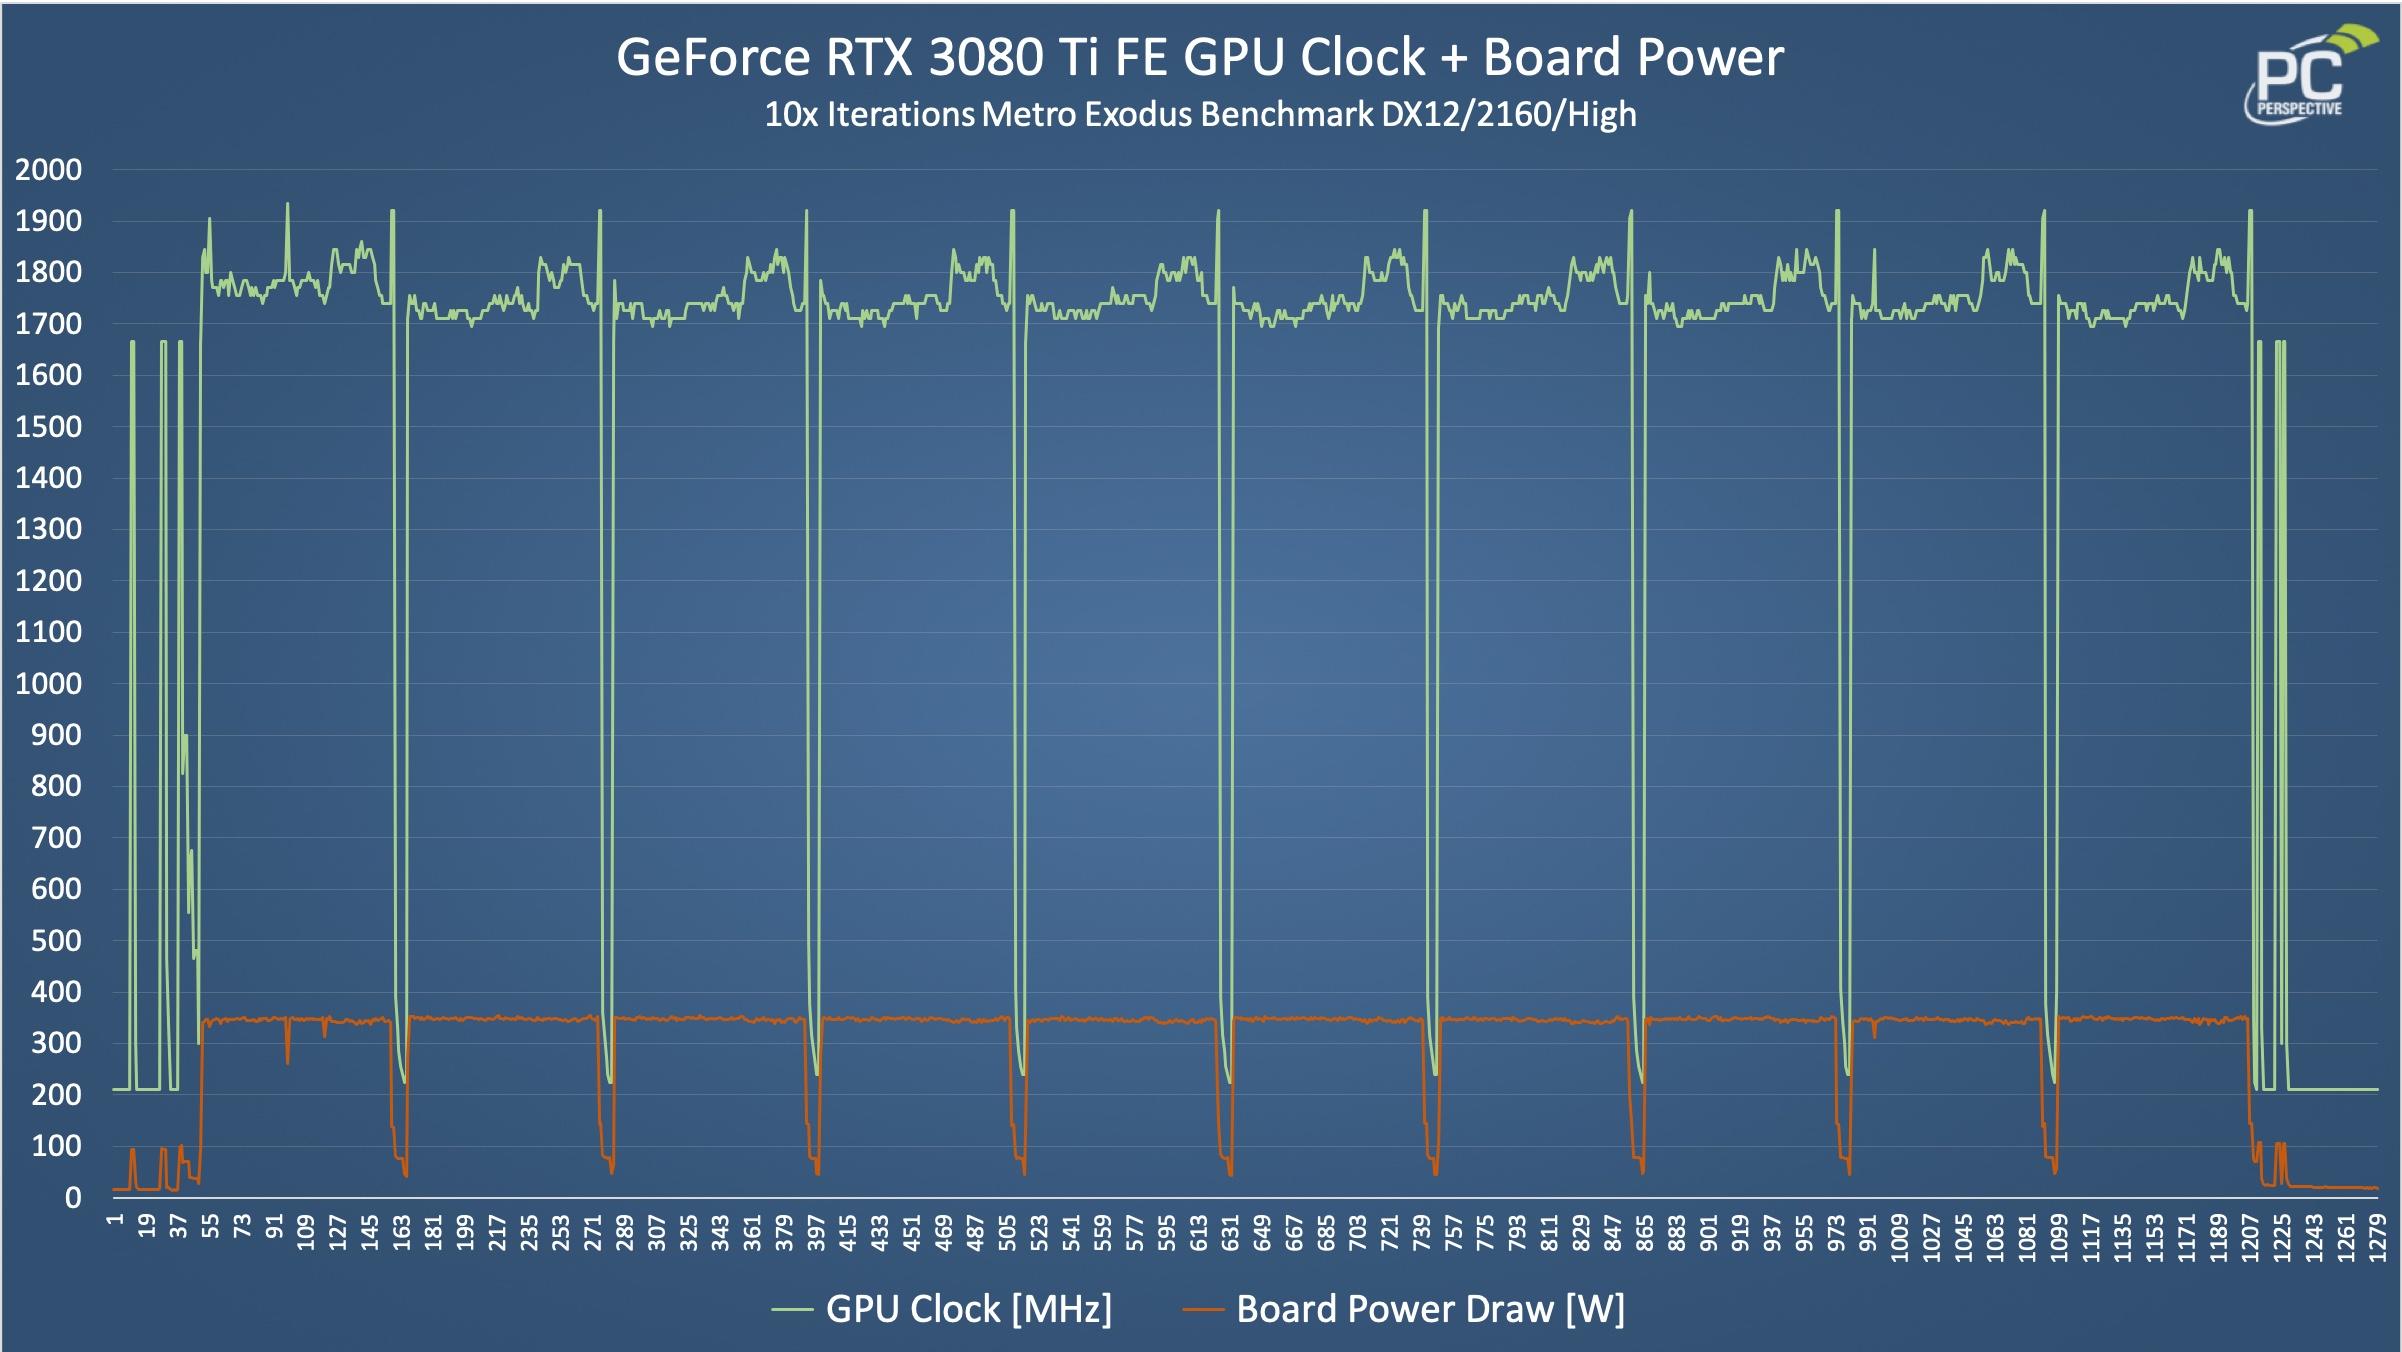 RTX 3080 Ti FE Clocks and Power Chart